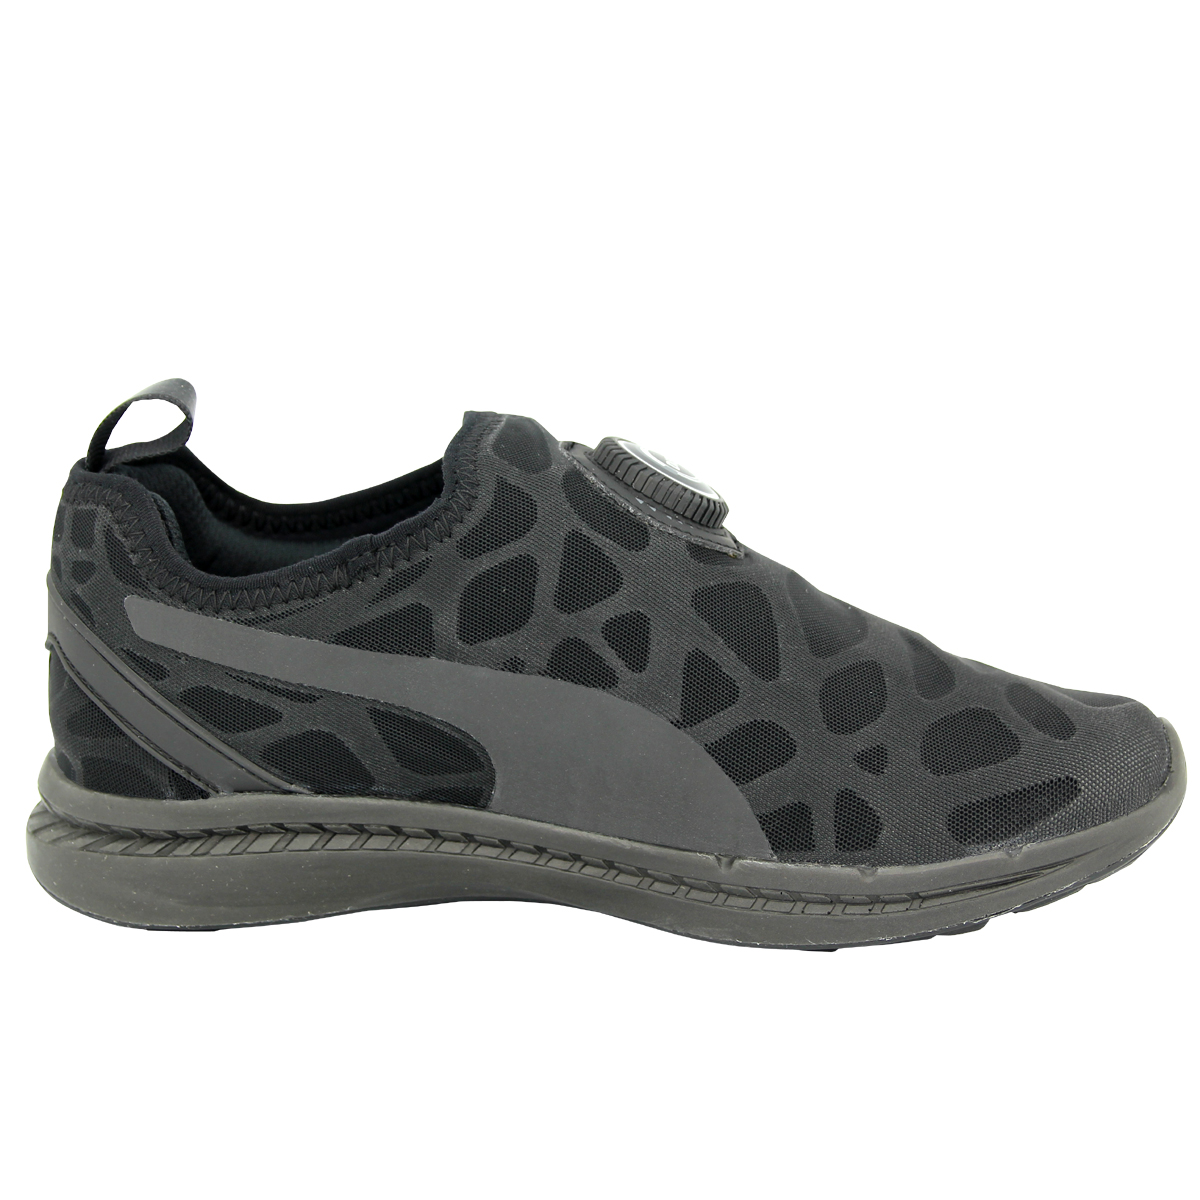 237ed328fdfa PUMA Ignite Disc Sleeve Street Foam Rihanna Black Mens Running Shoes ...